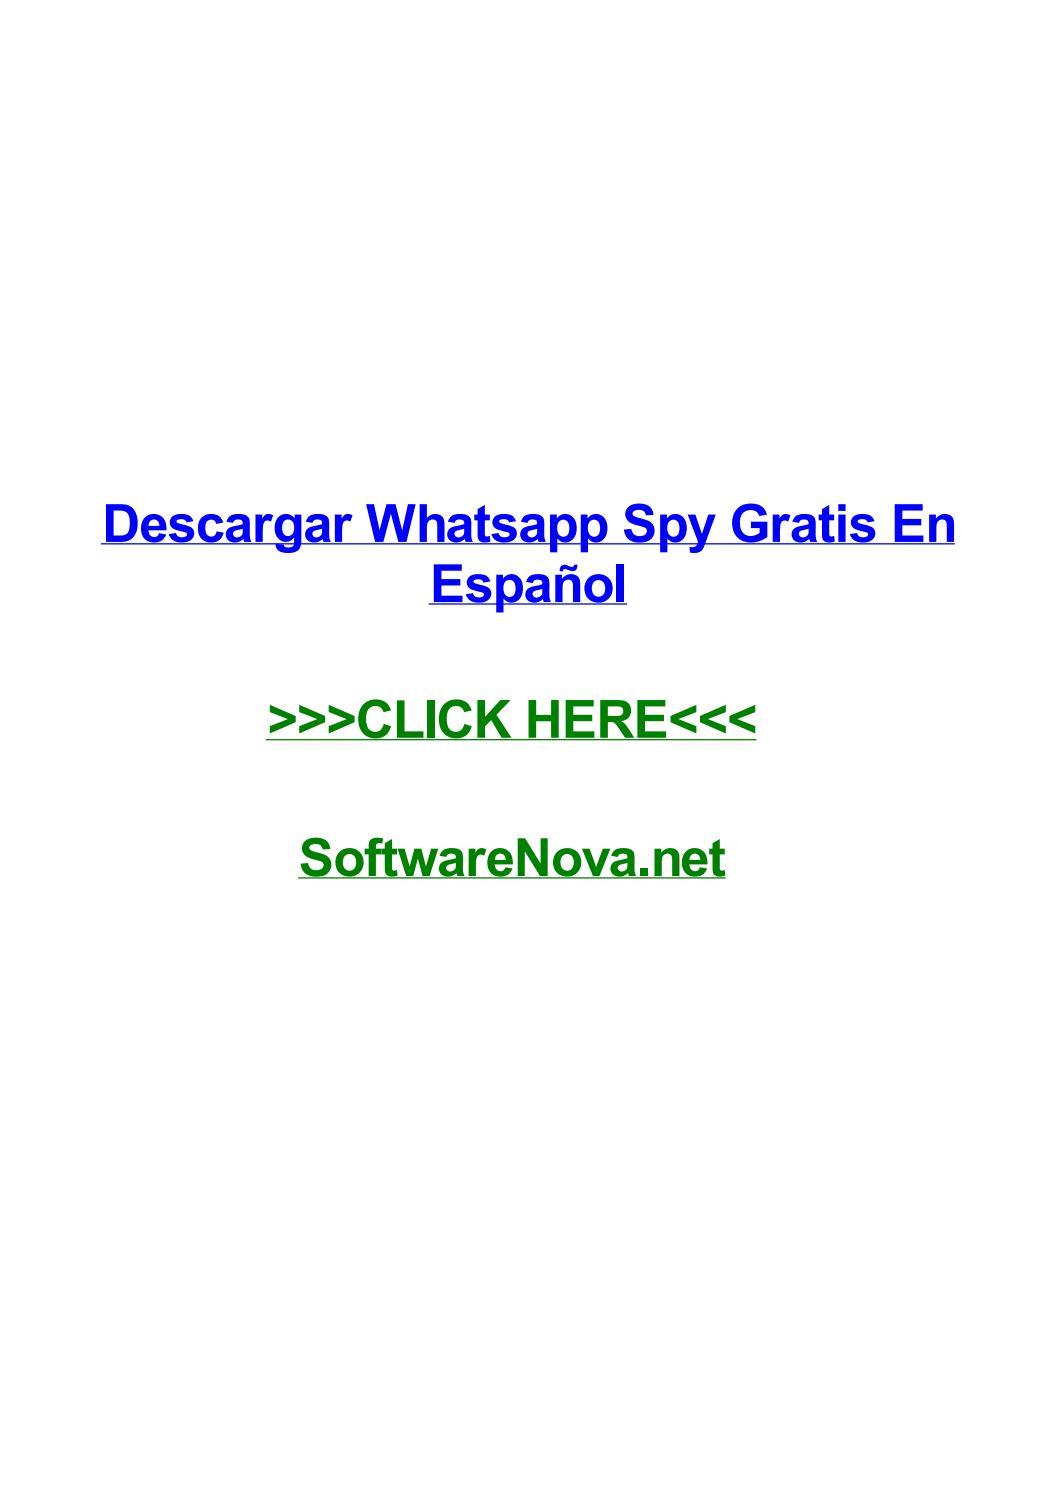 Descargar Whatsapp Spy Gratis En Espaгol By Trevermmgsv Issuu